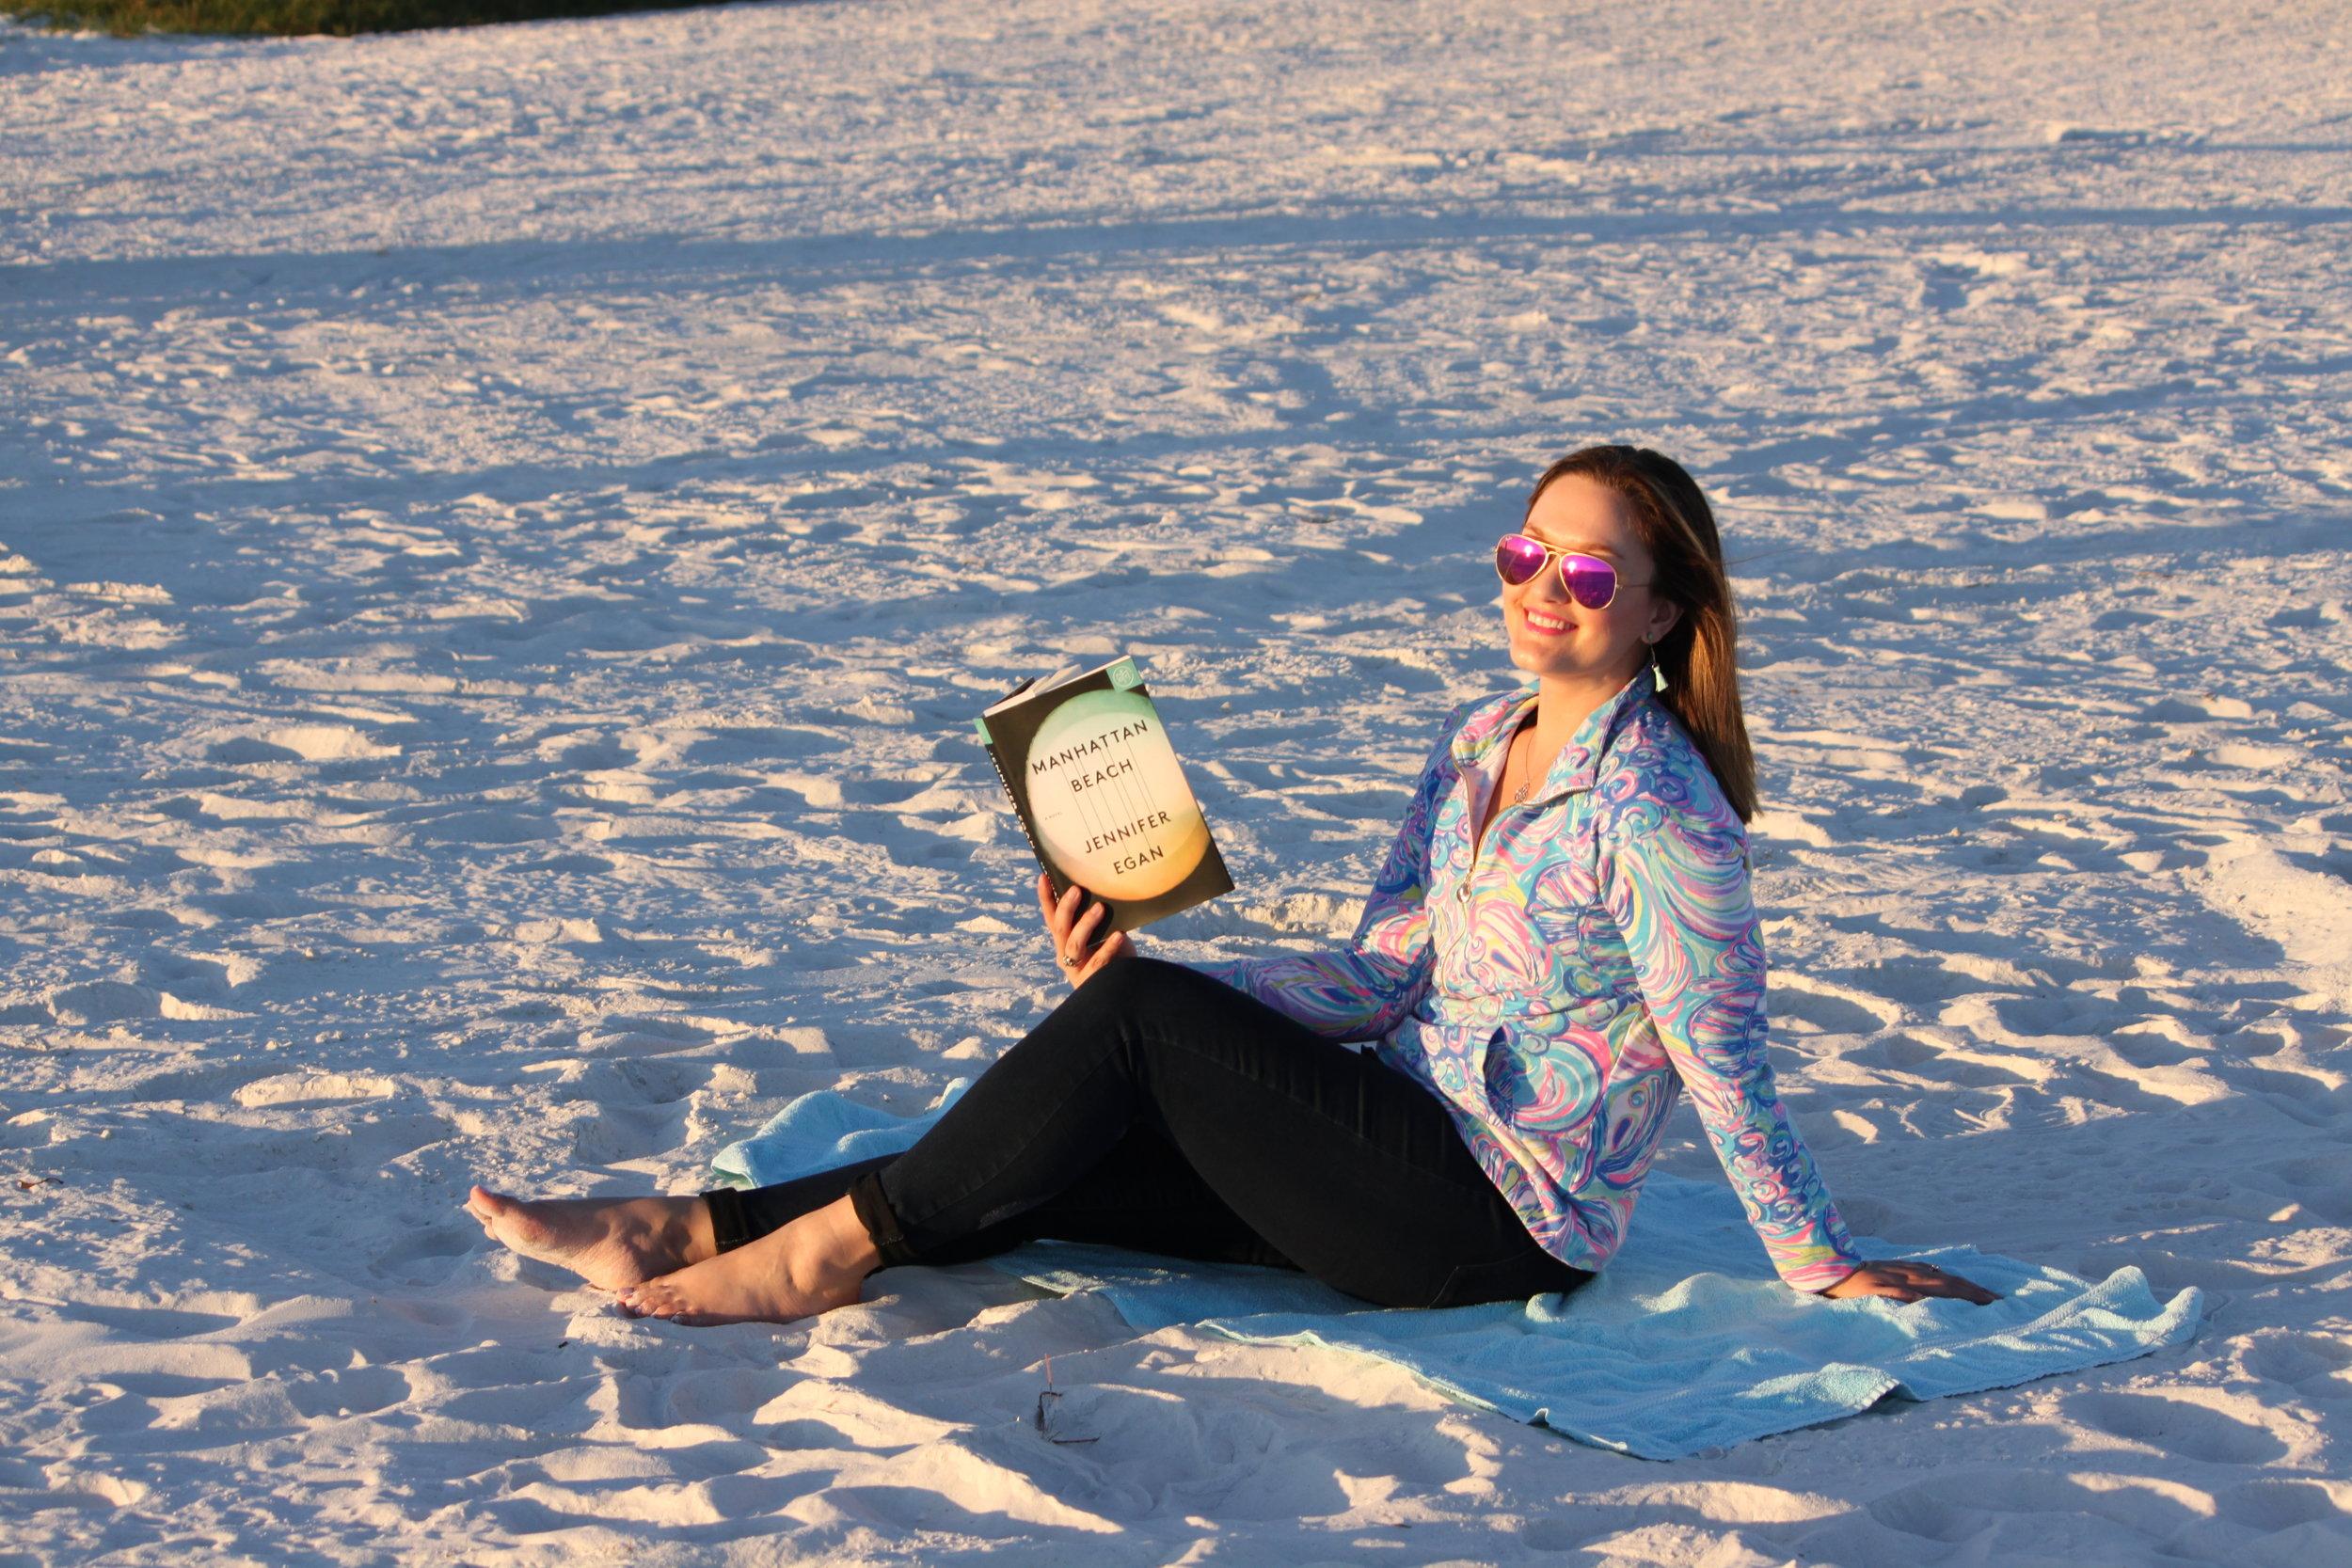 Reading Manhattan Beach by Jennifer Egan on Siesta Key Beach